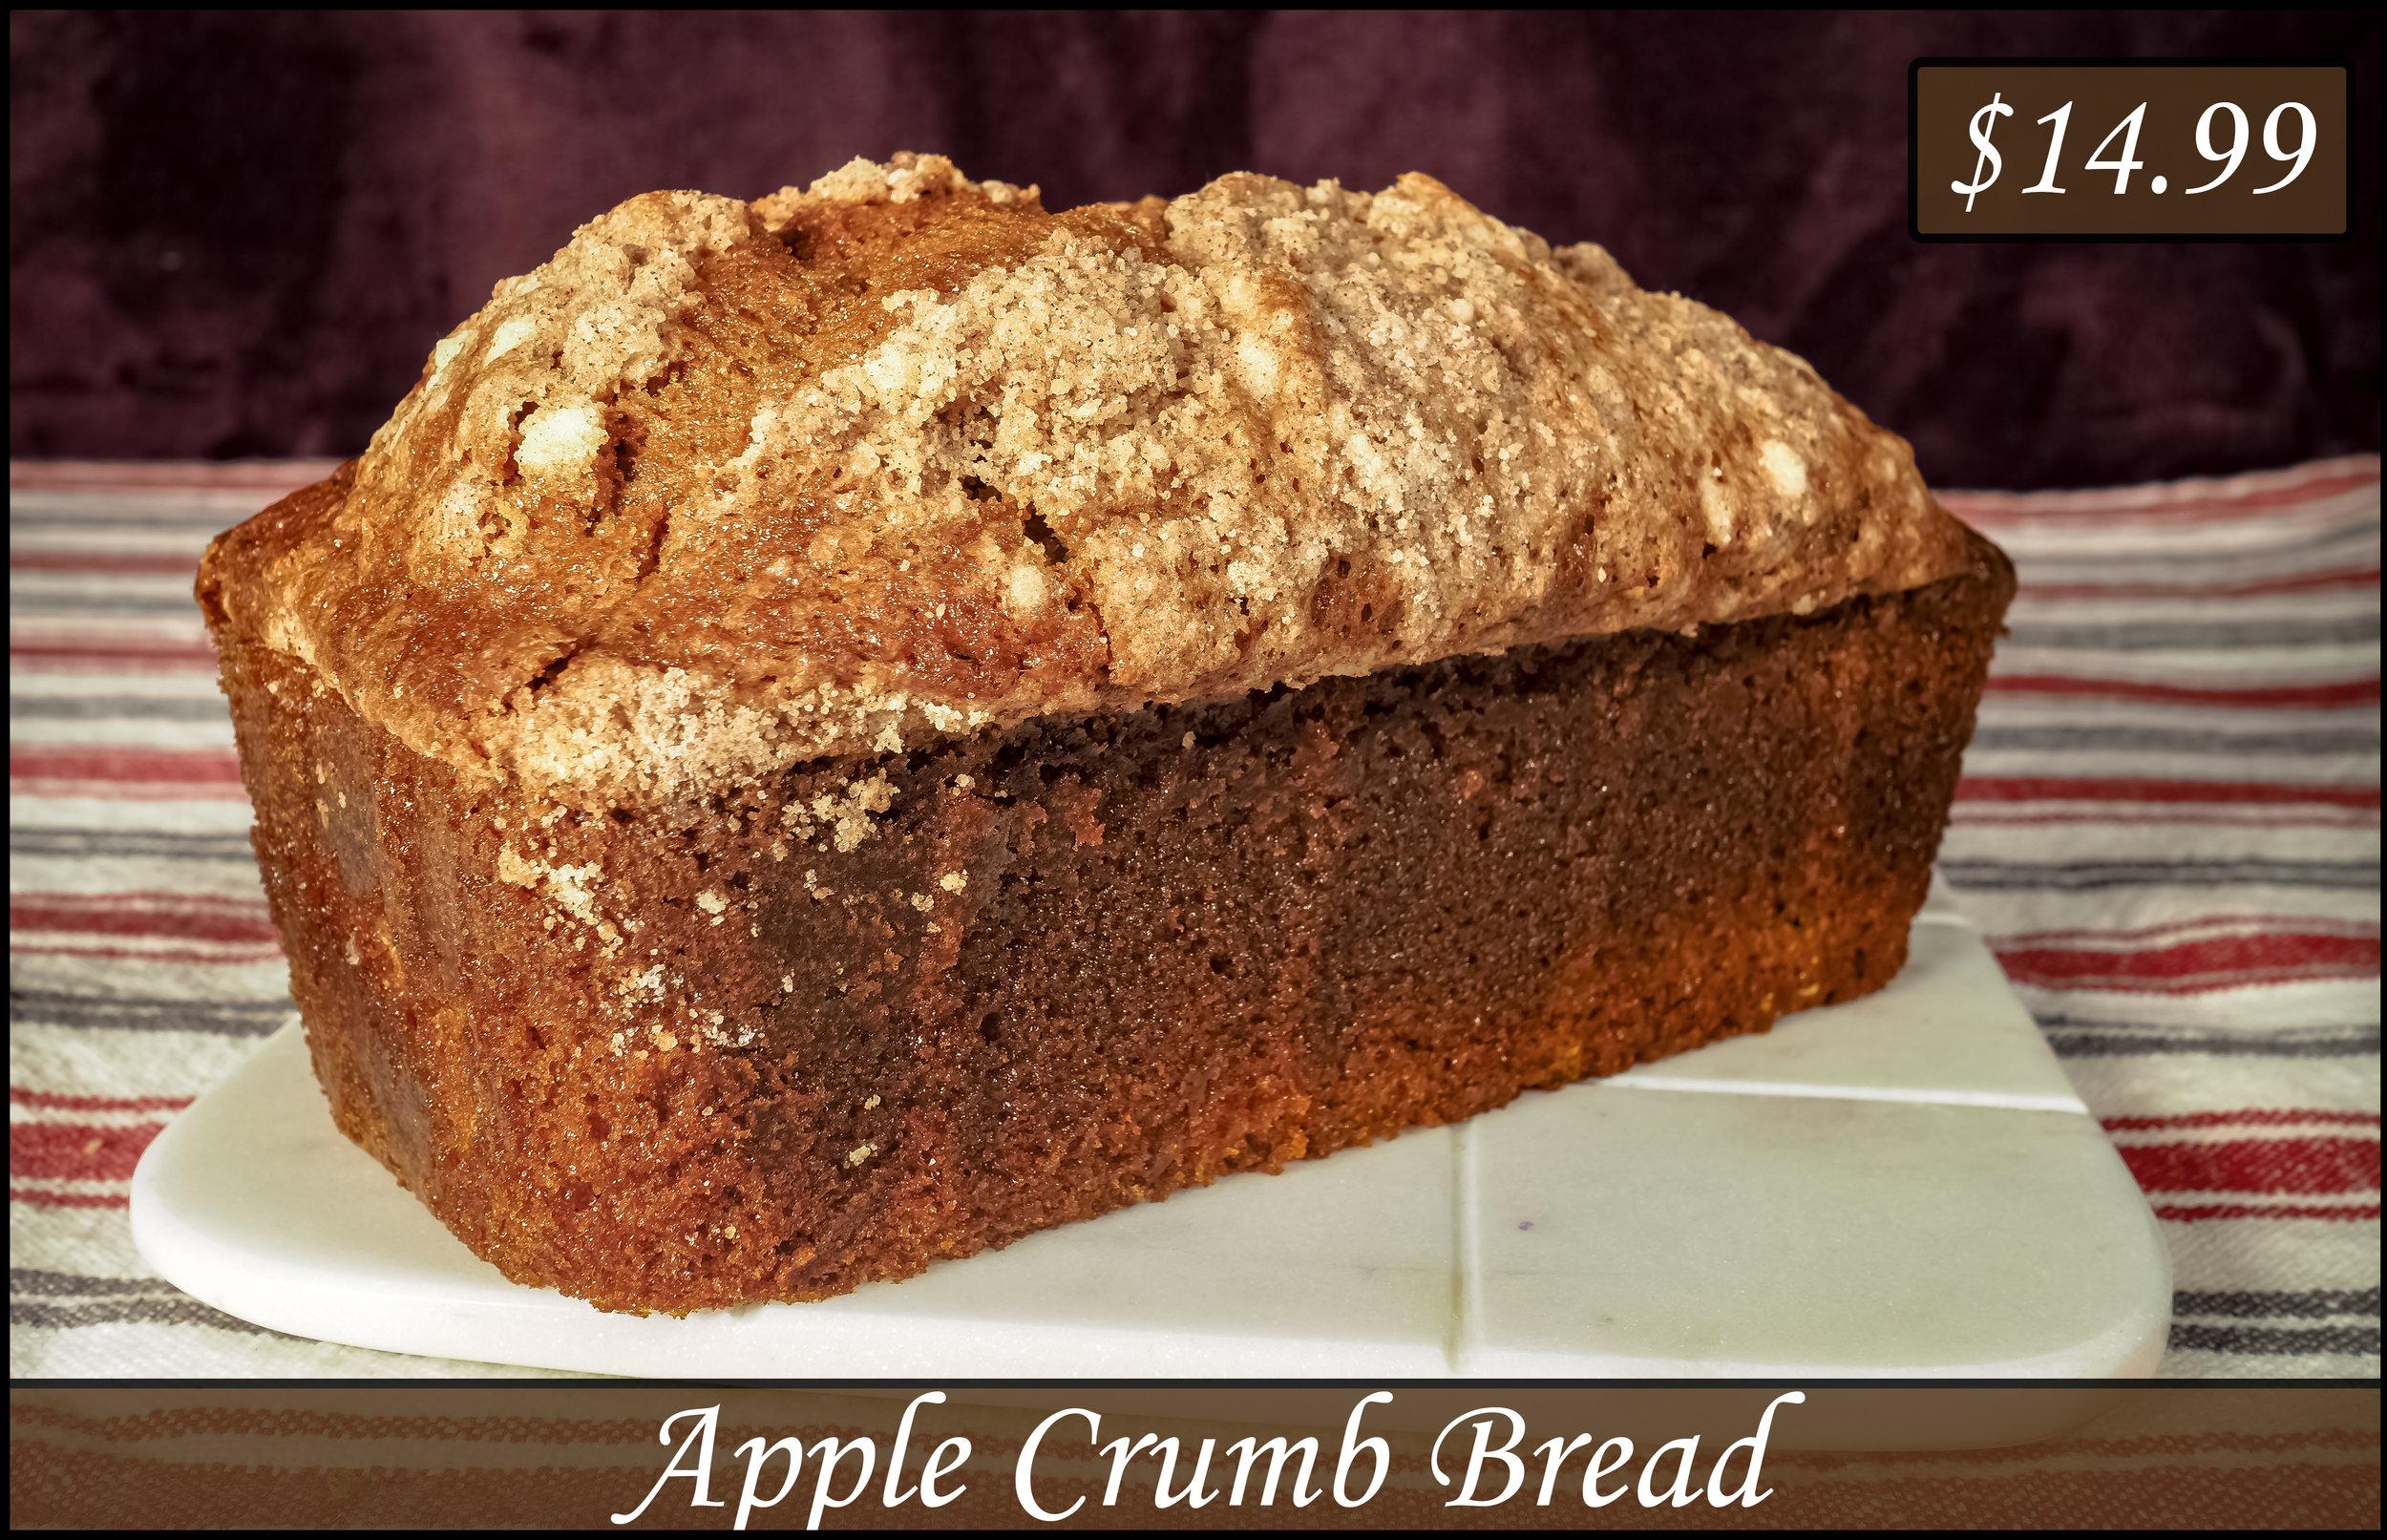 Apple Crumb Bread.jpg